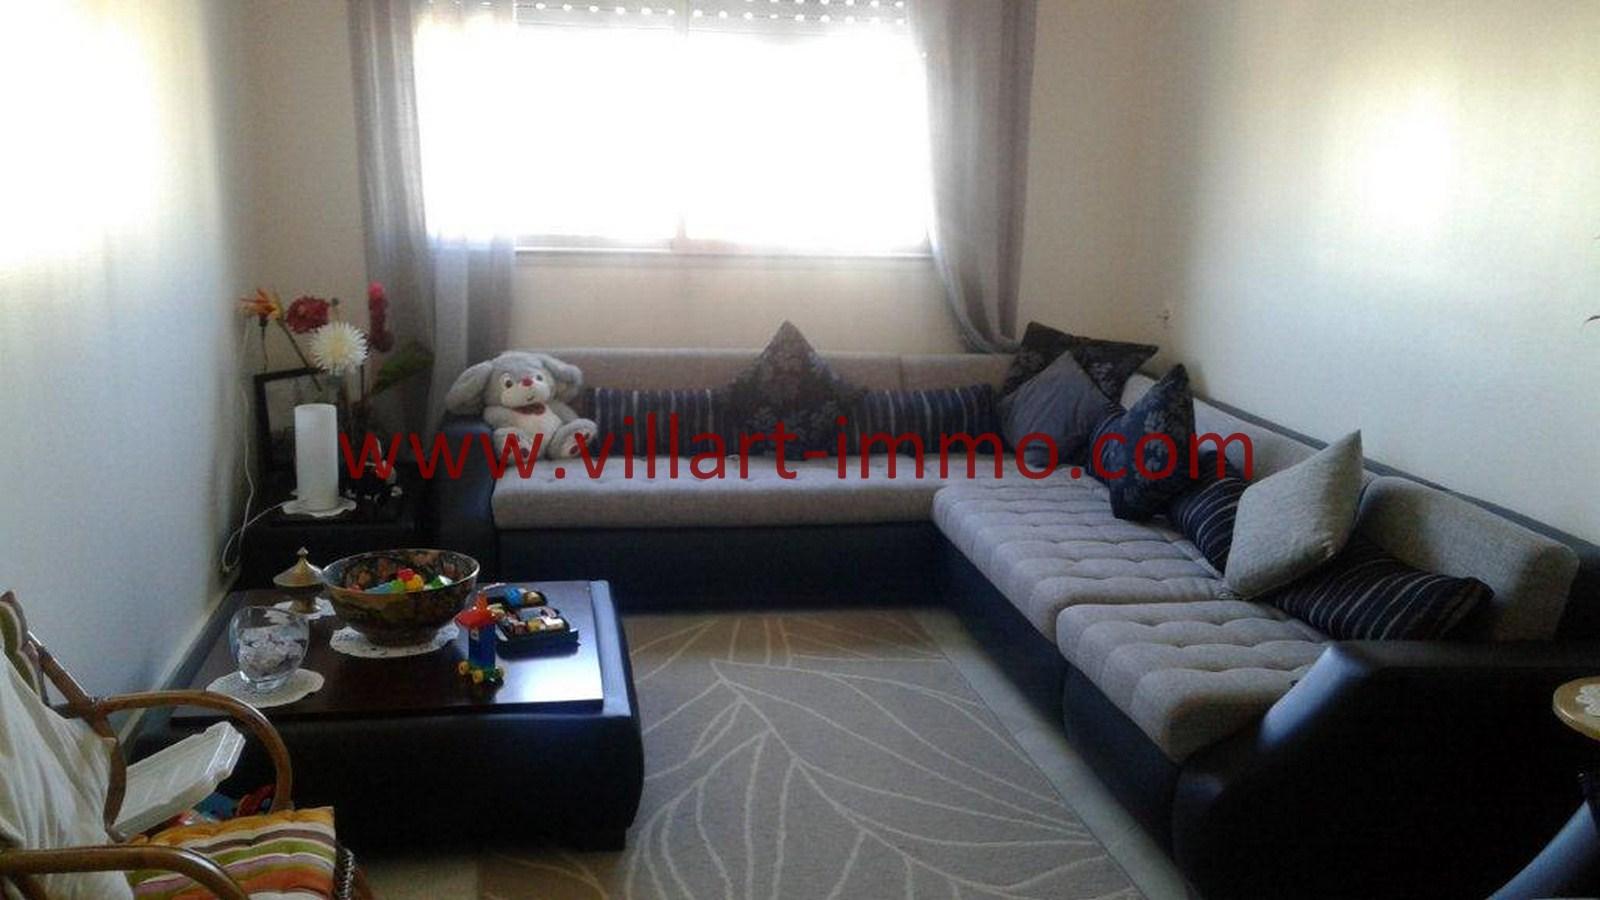 1-A louer -Appartement-Tanger-Castilla-Salon 1-L1040-Villart immo-Agence Immobilière